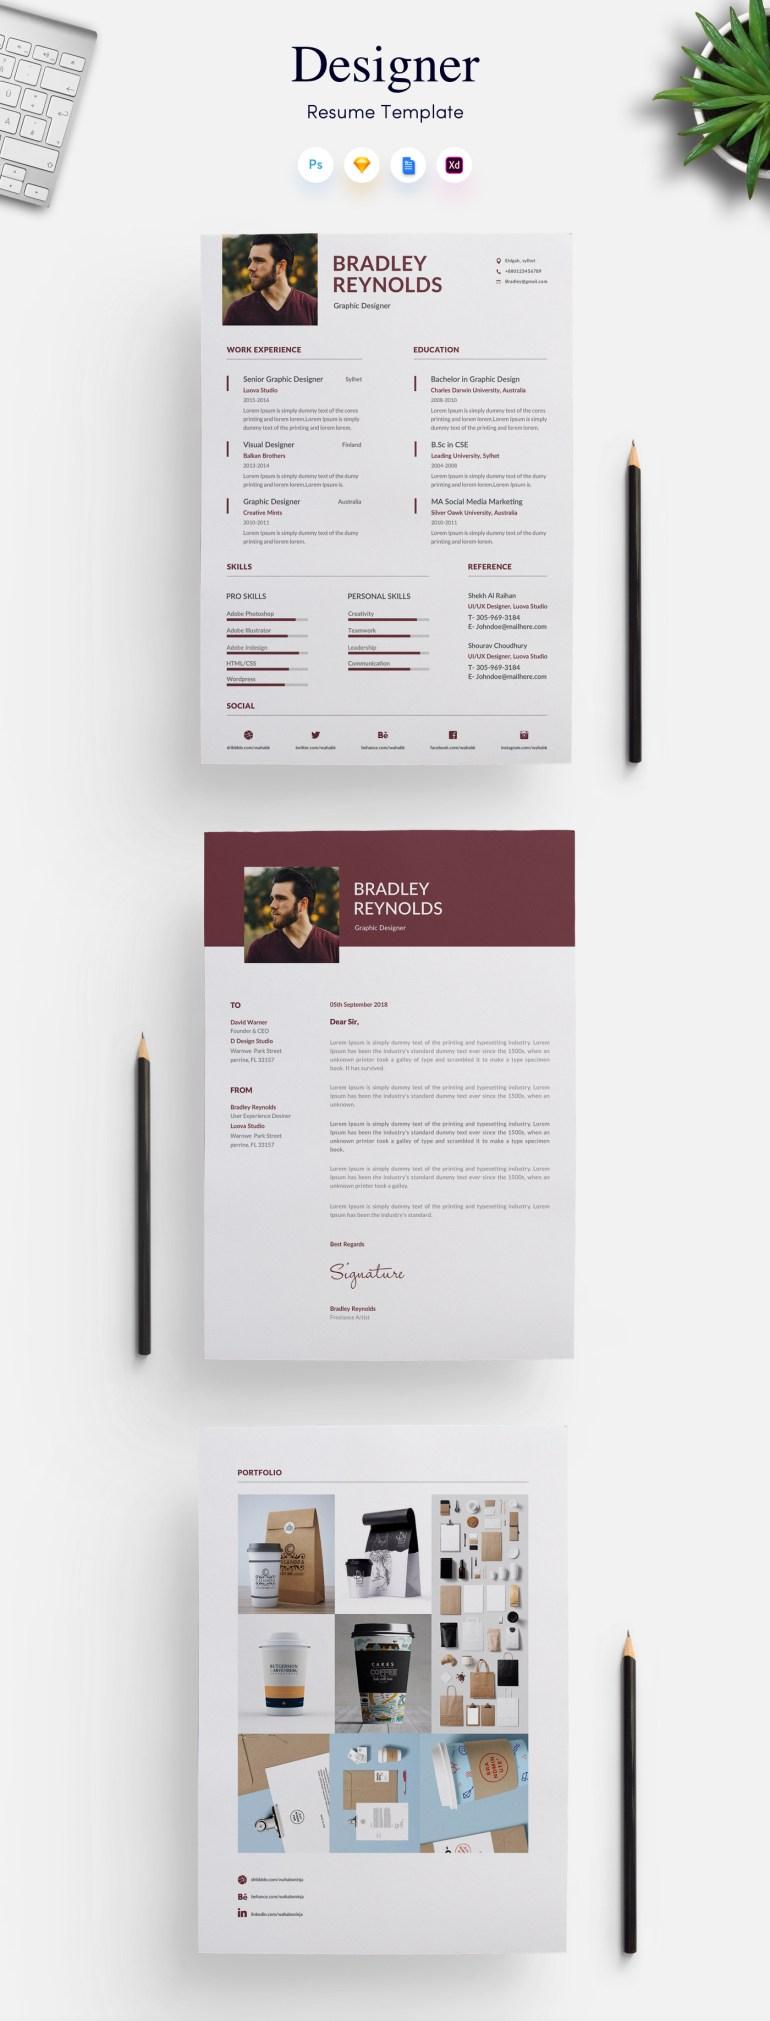 1. 3 page Designer CV/Resume Template